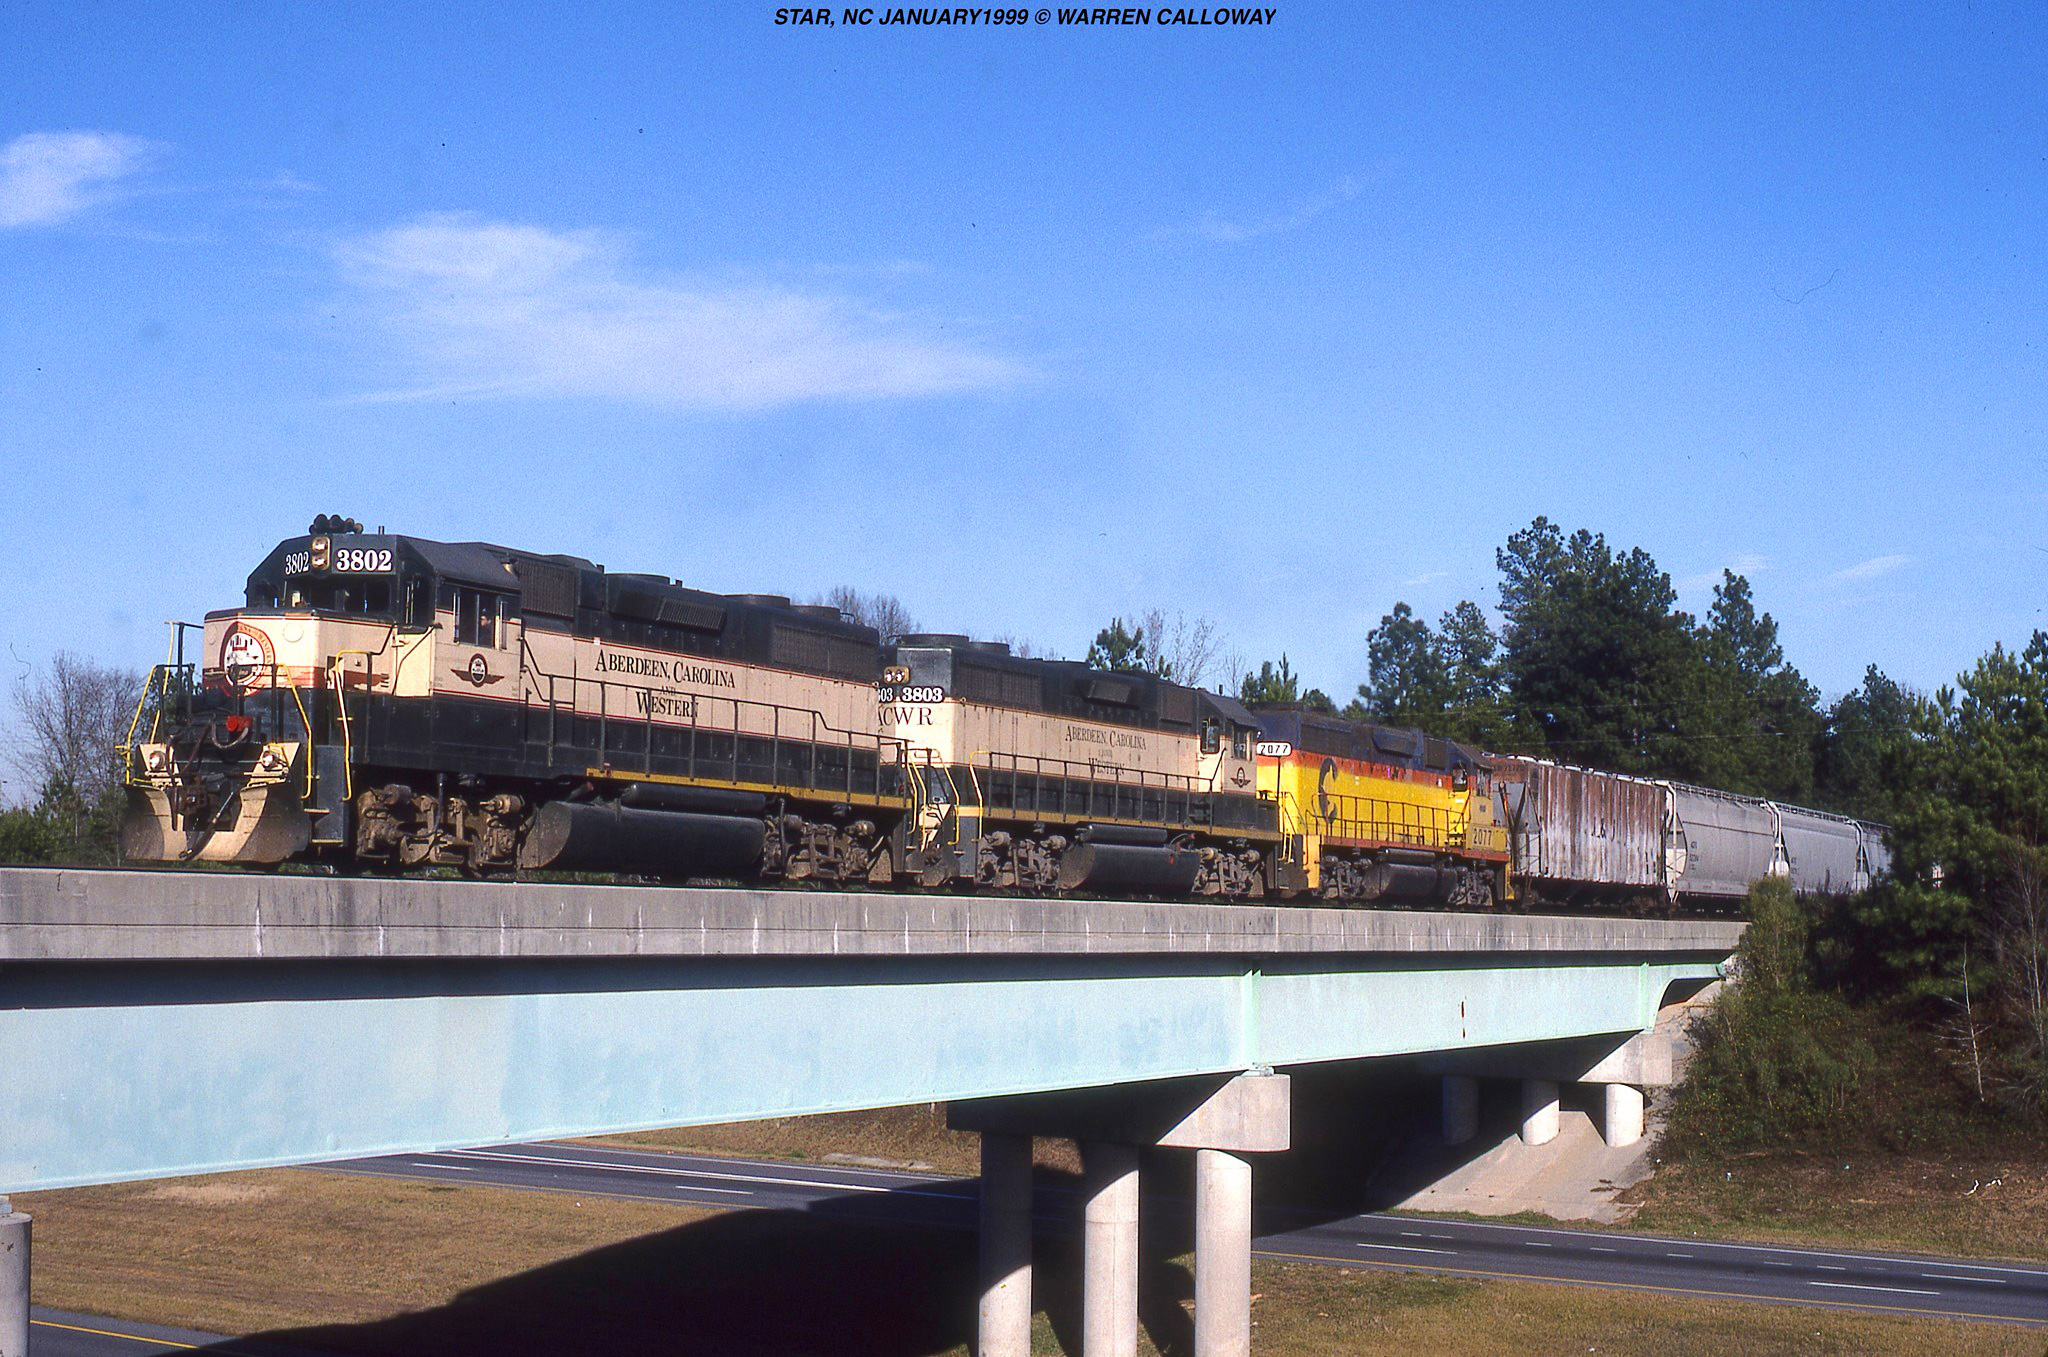 satanta dating Photo date: may 15, 1997  location: satanta, kansas, usa  northwest as an  eastbound cimarron valley freight train begins its day at satanta, ks on sept.